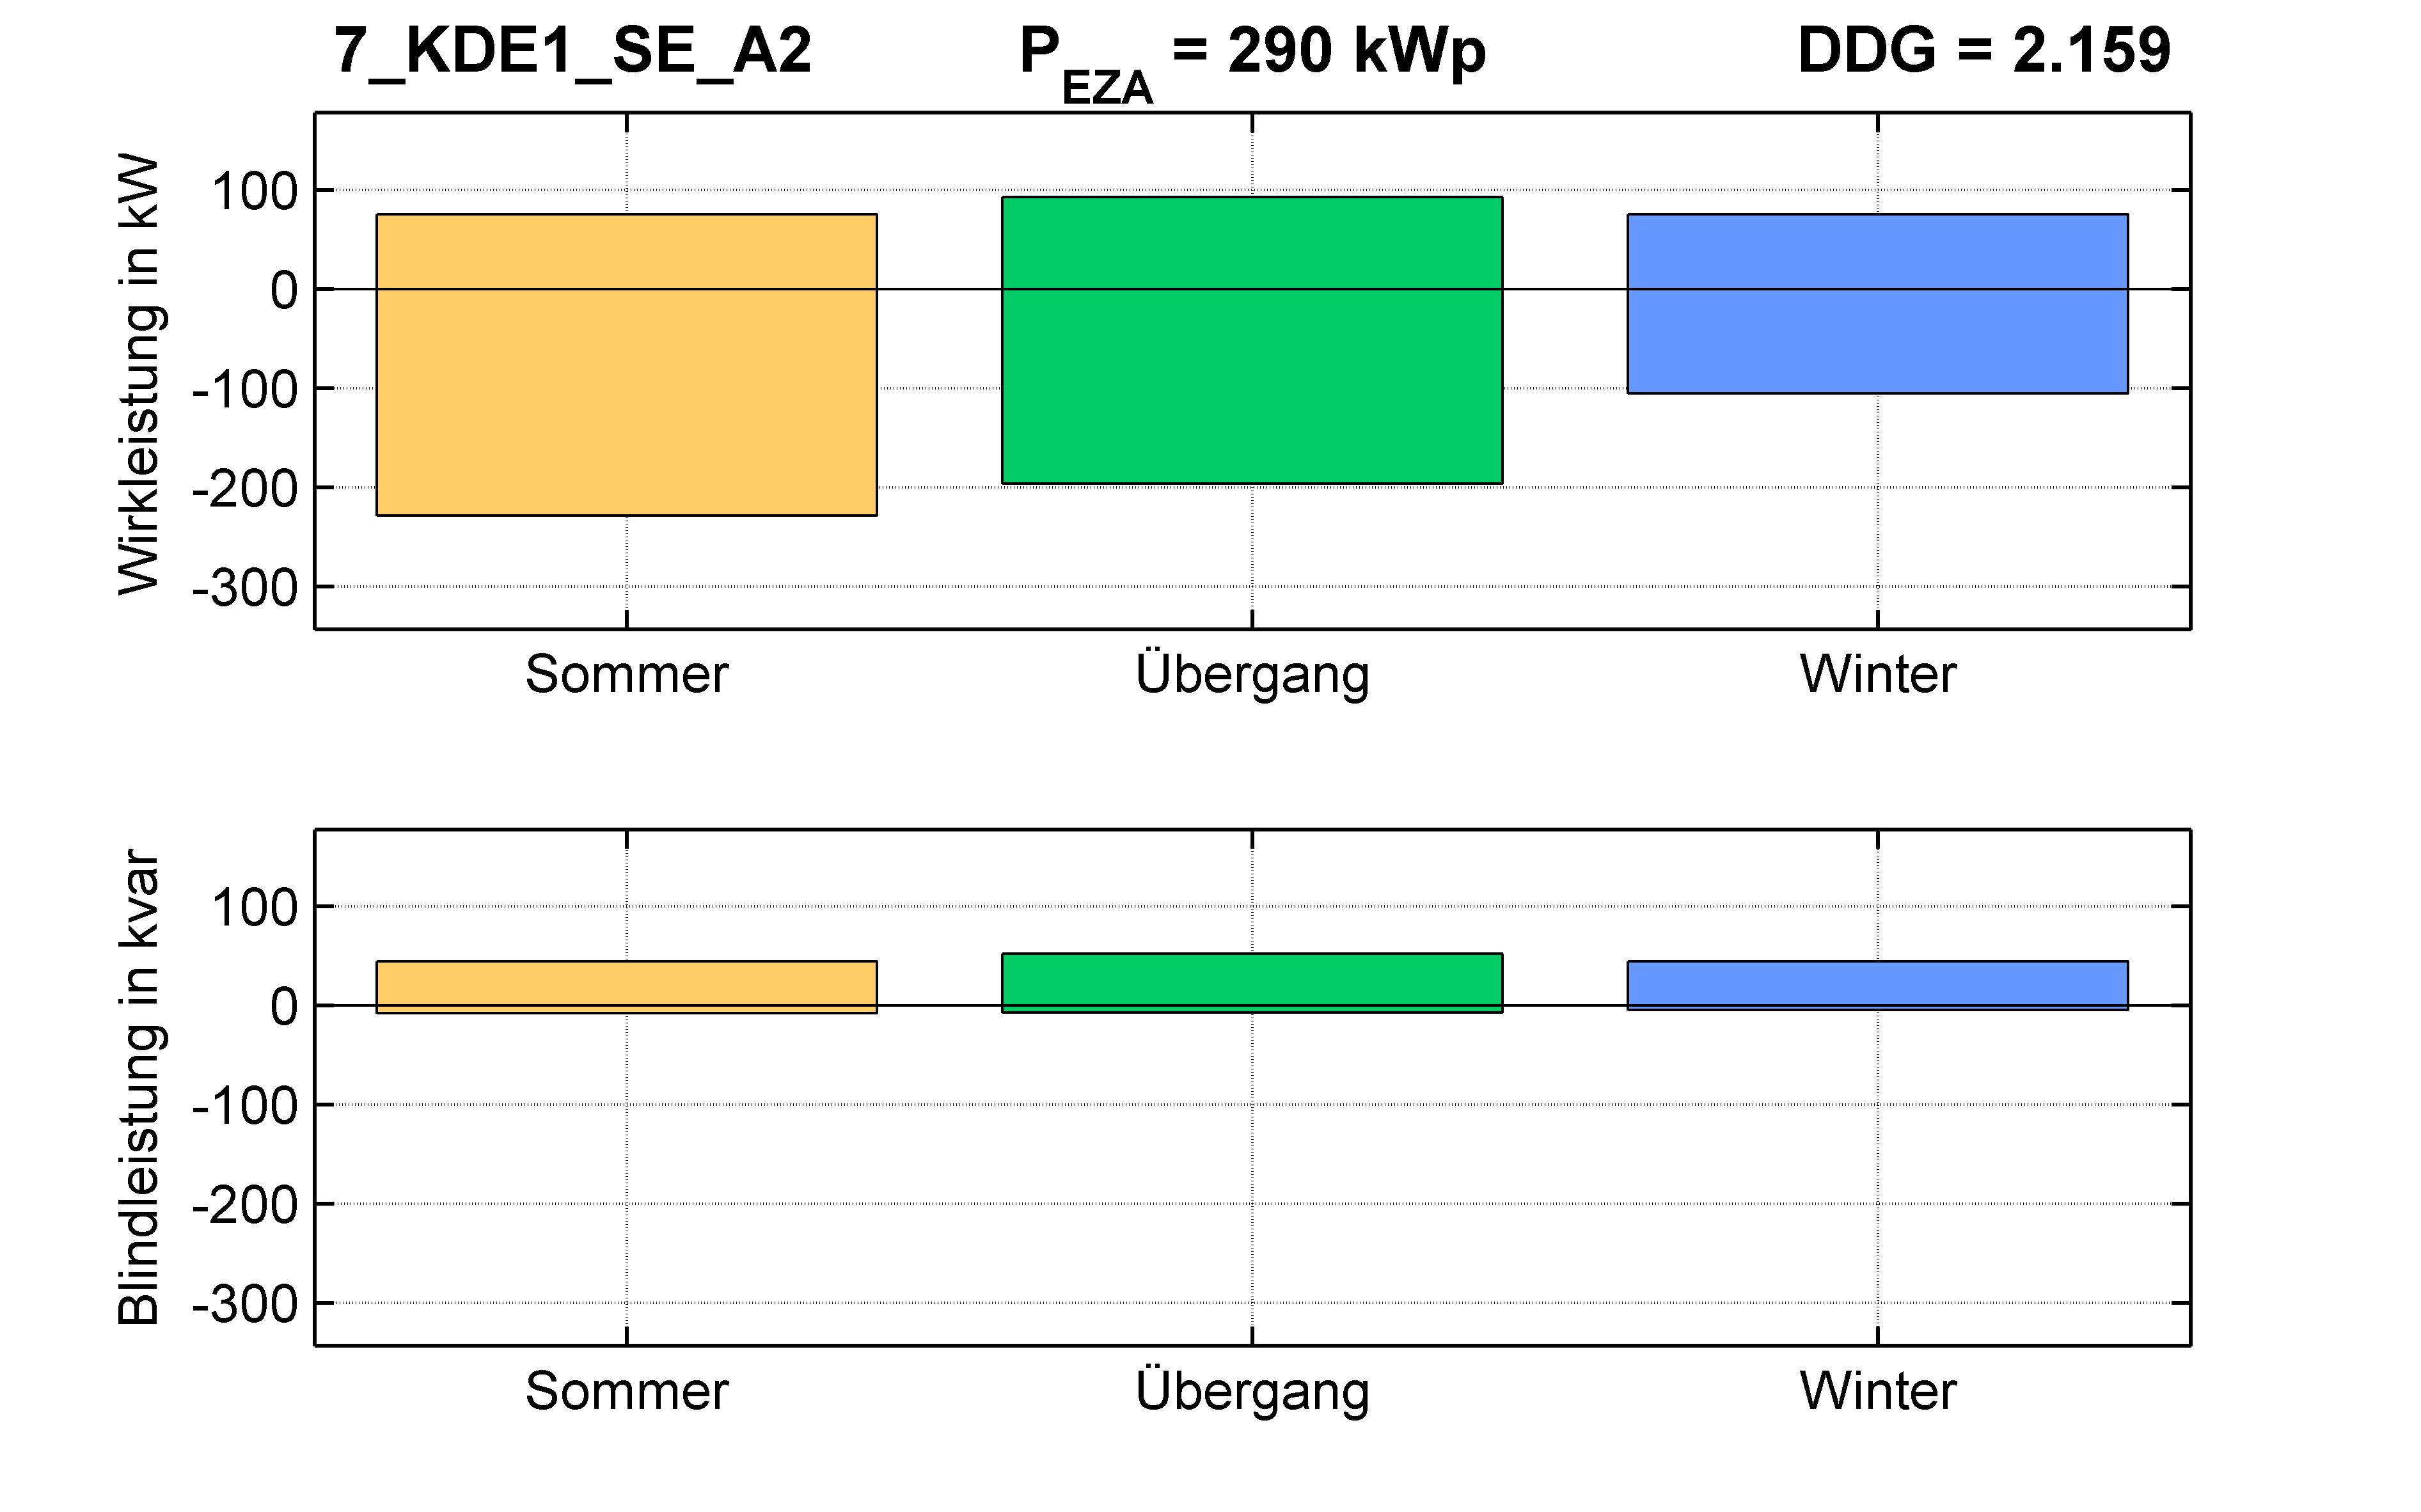 KDE1 | Längsregler (SE) A2 | PQ-Bilanz